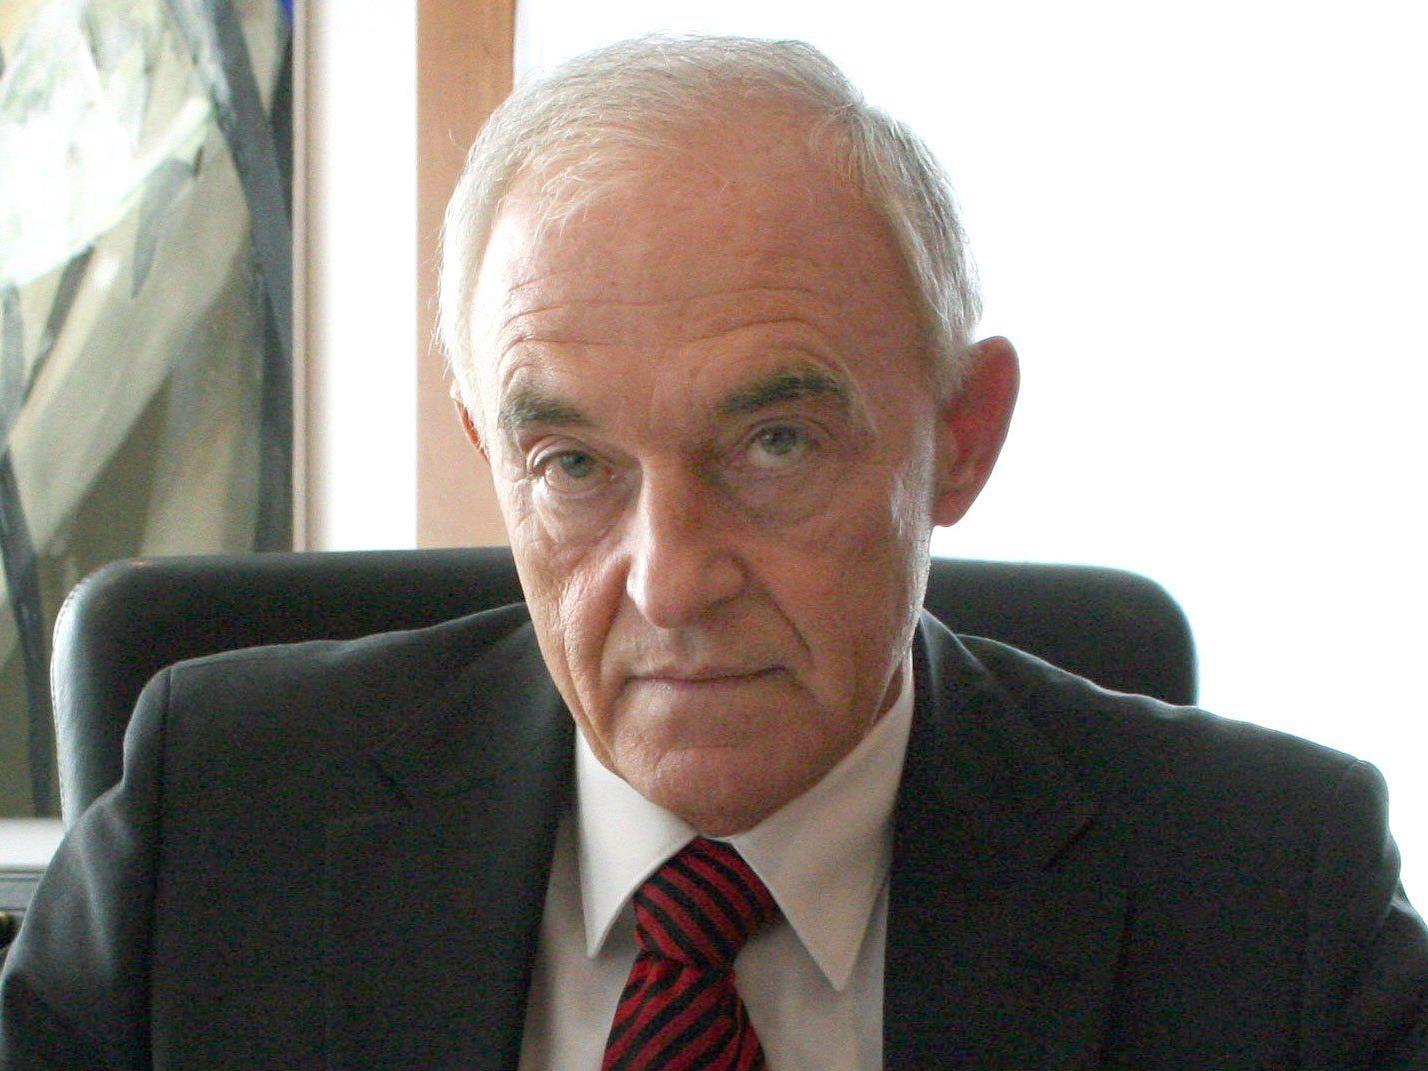 BEGAS-Affäre: Korruptionsstaatsanwaltschaft klagt früheren Chef Rudolf Simandl an.